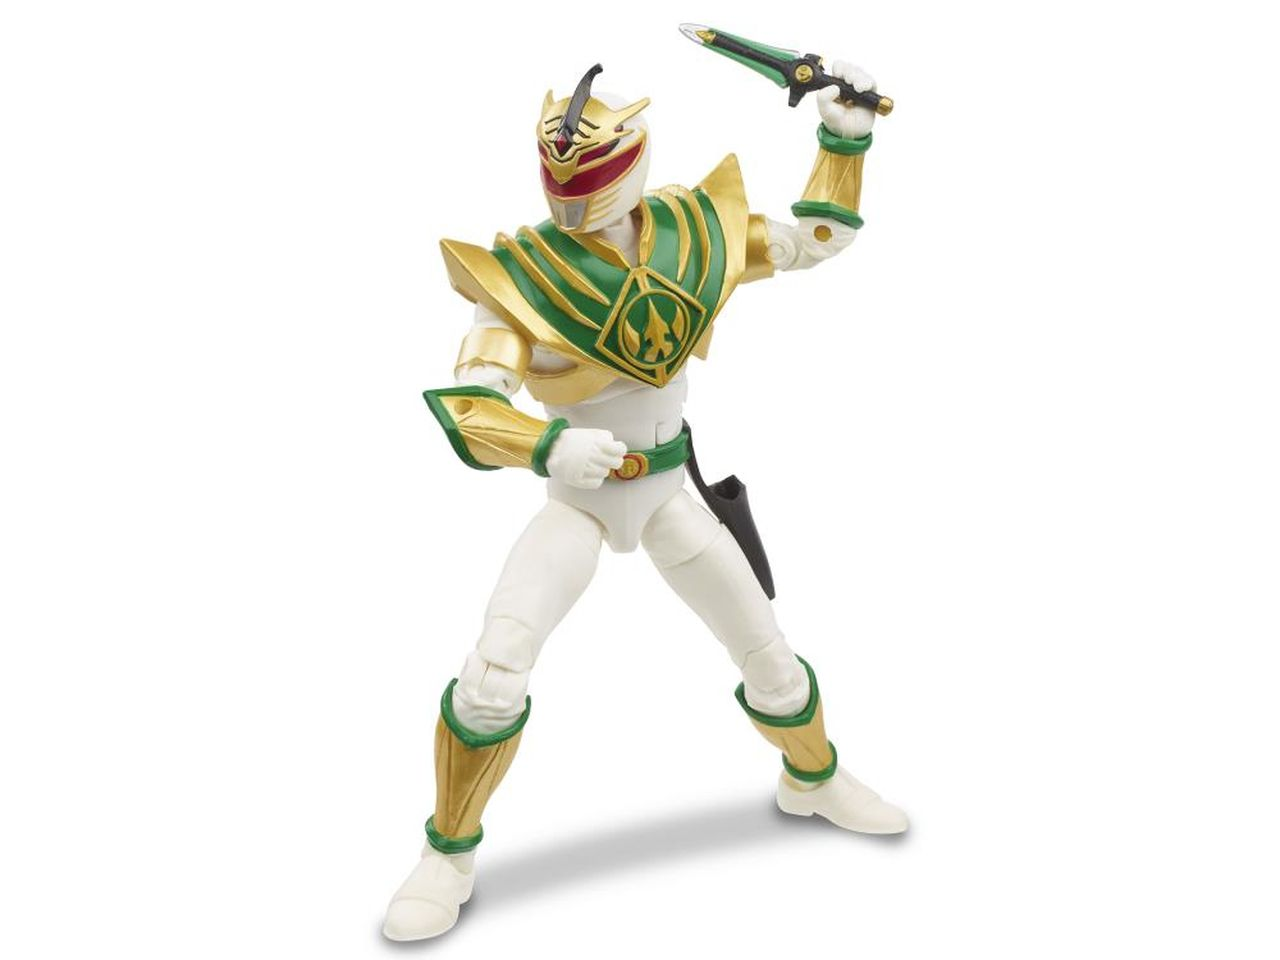 Action Figure Ranger Branco (Mighty Morphin Lord Drakkon): Power Rangers (Lightning Collection) - Hasbro